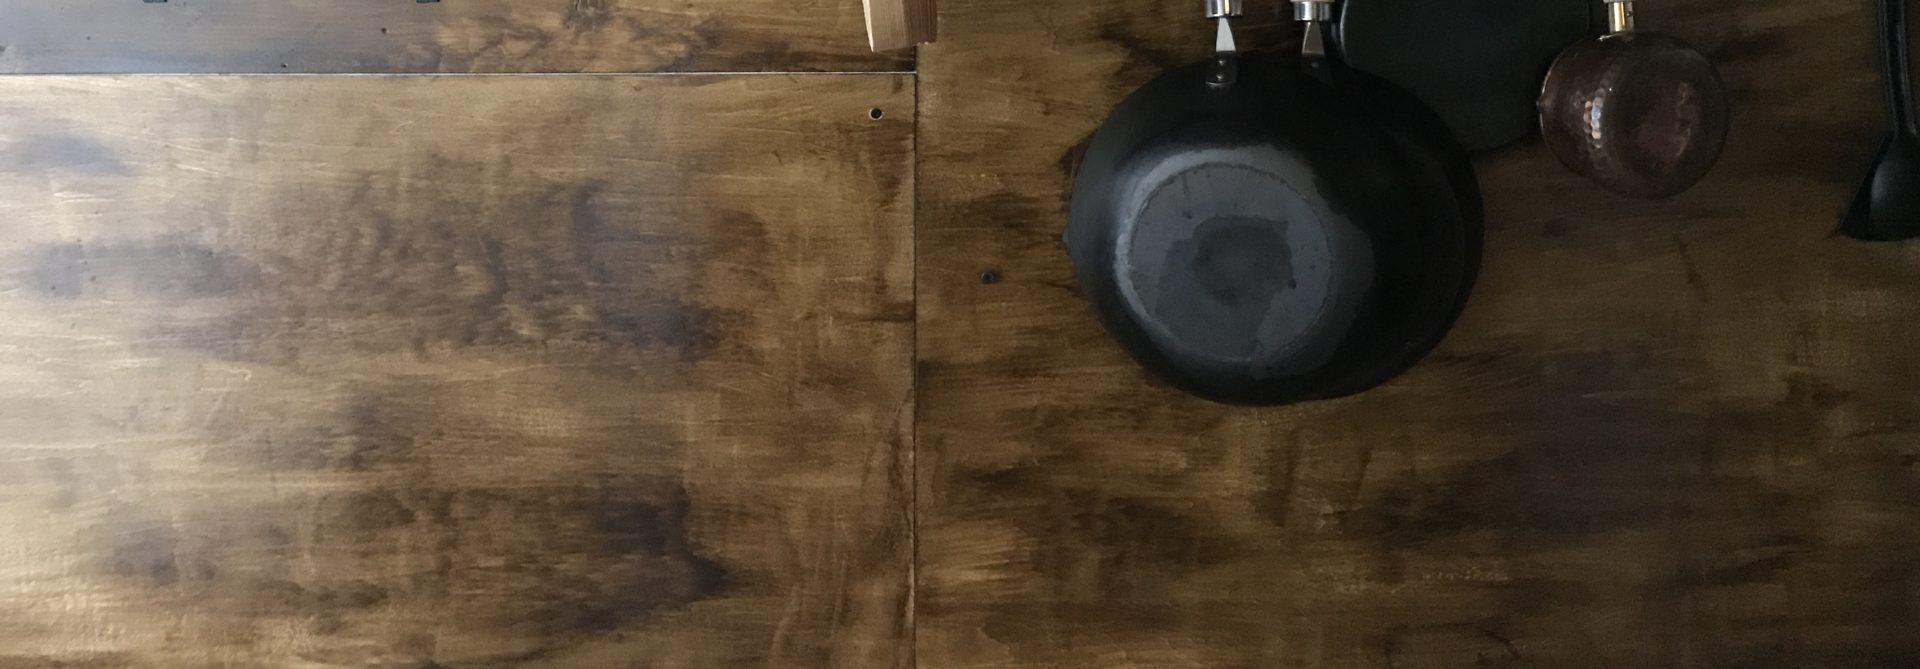 Simple Brew Life